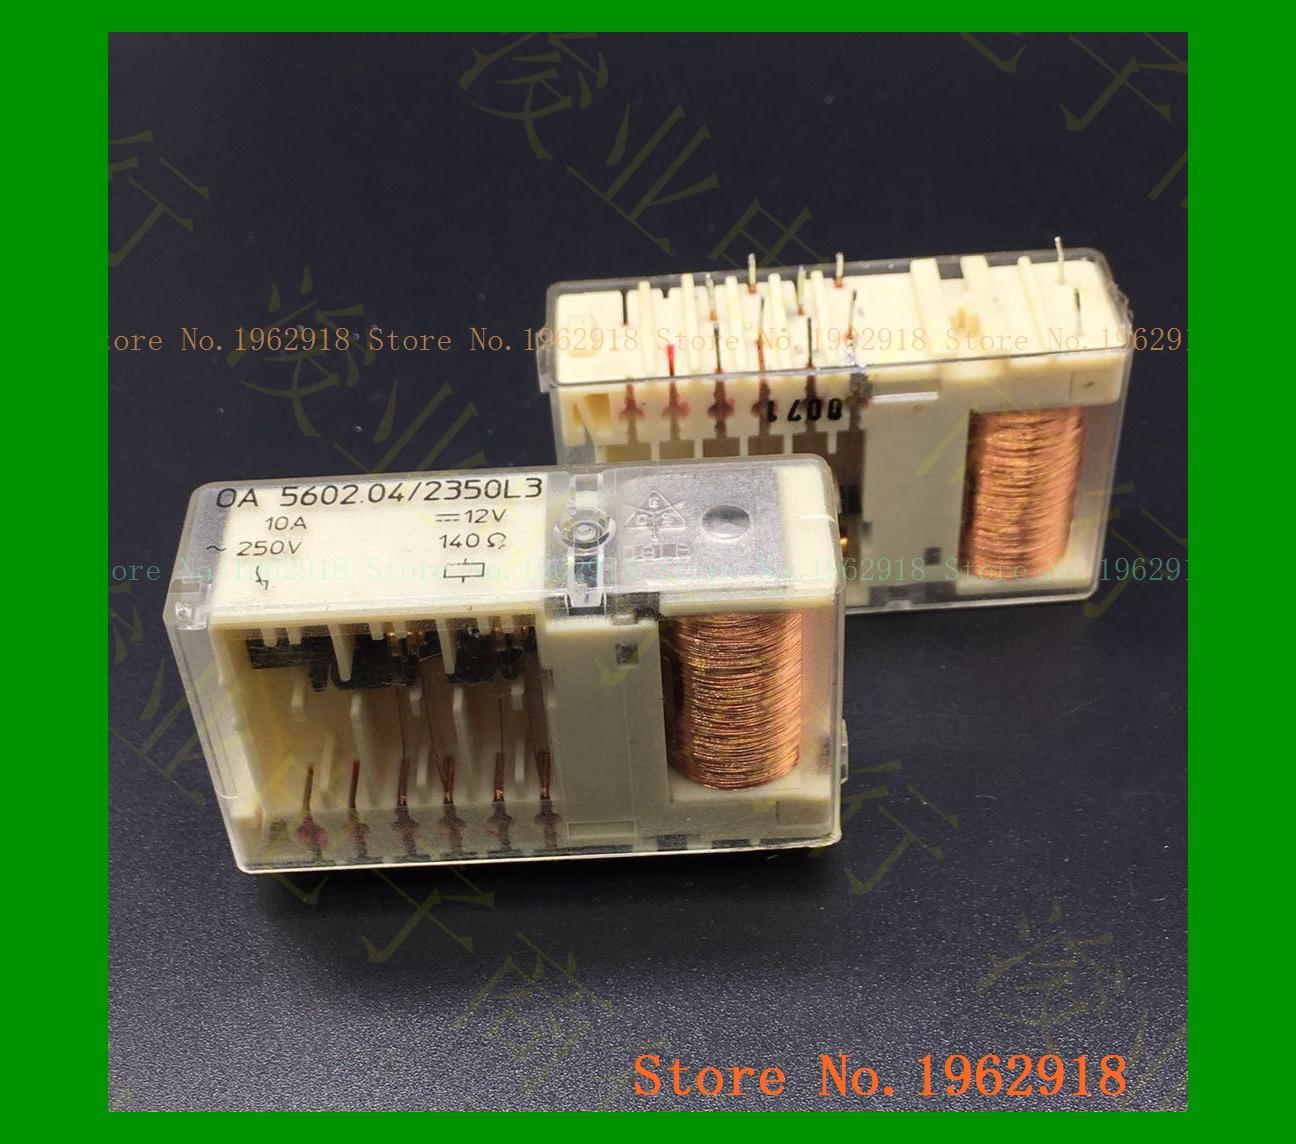 OA 5602.04/2350L3 12v 10A 10 0A5602.04/2350L3